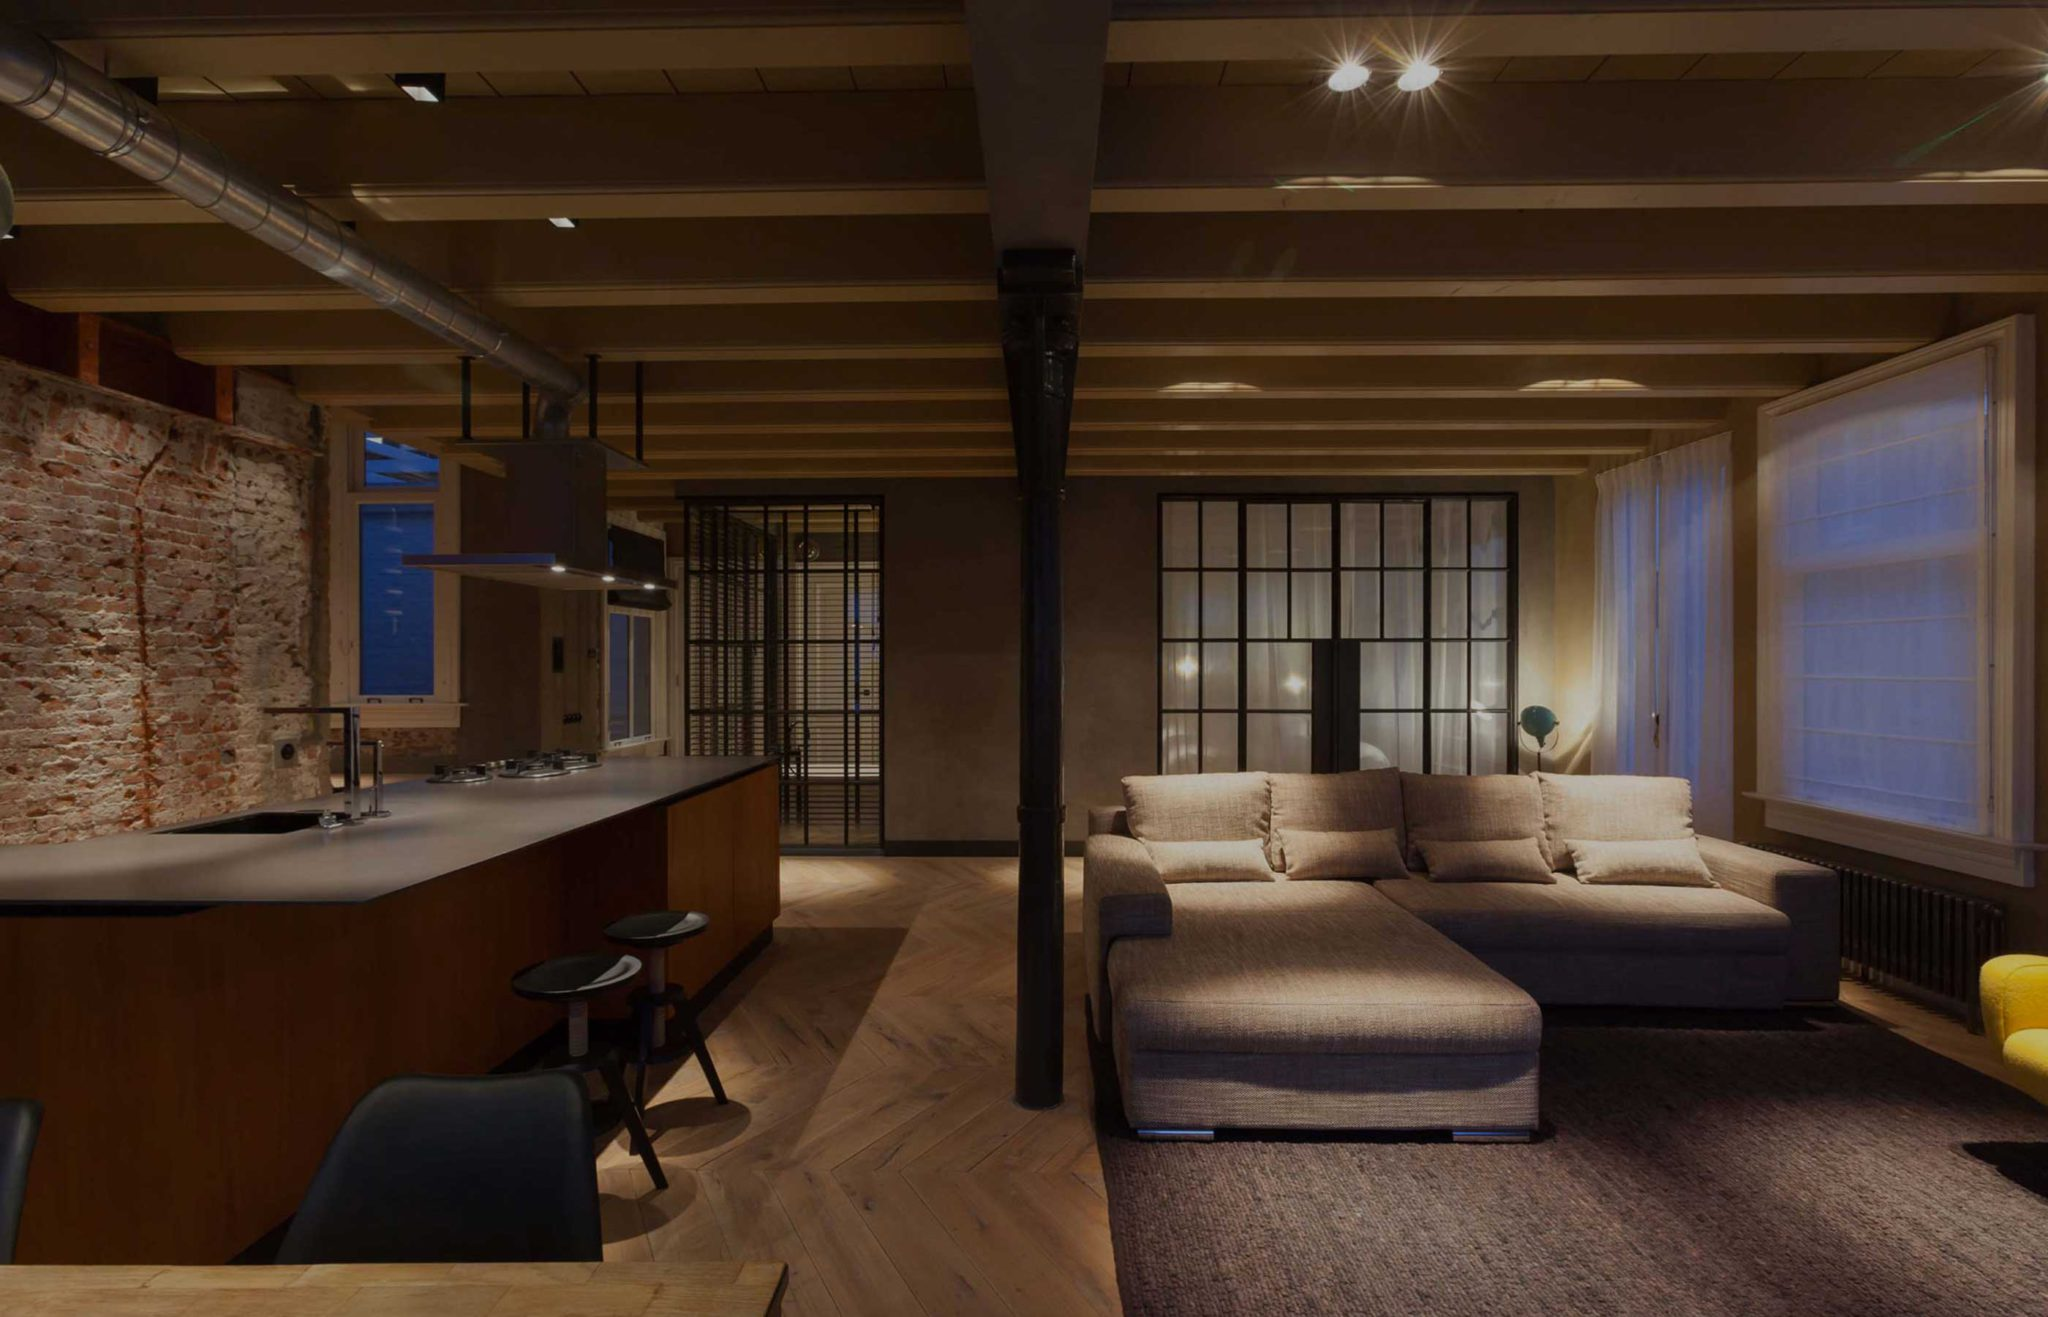 Portfolio overzicht interieurontwerper Cris van Amsterdam